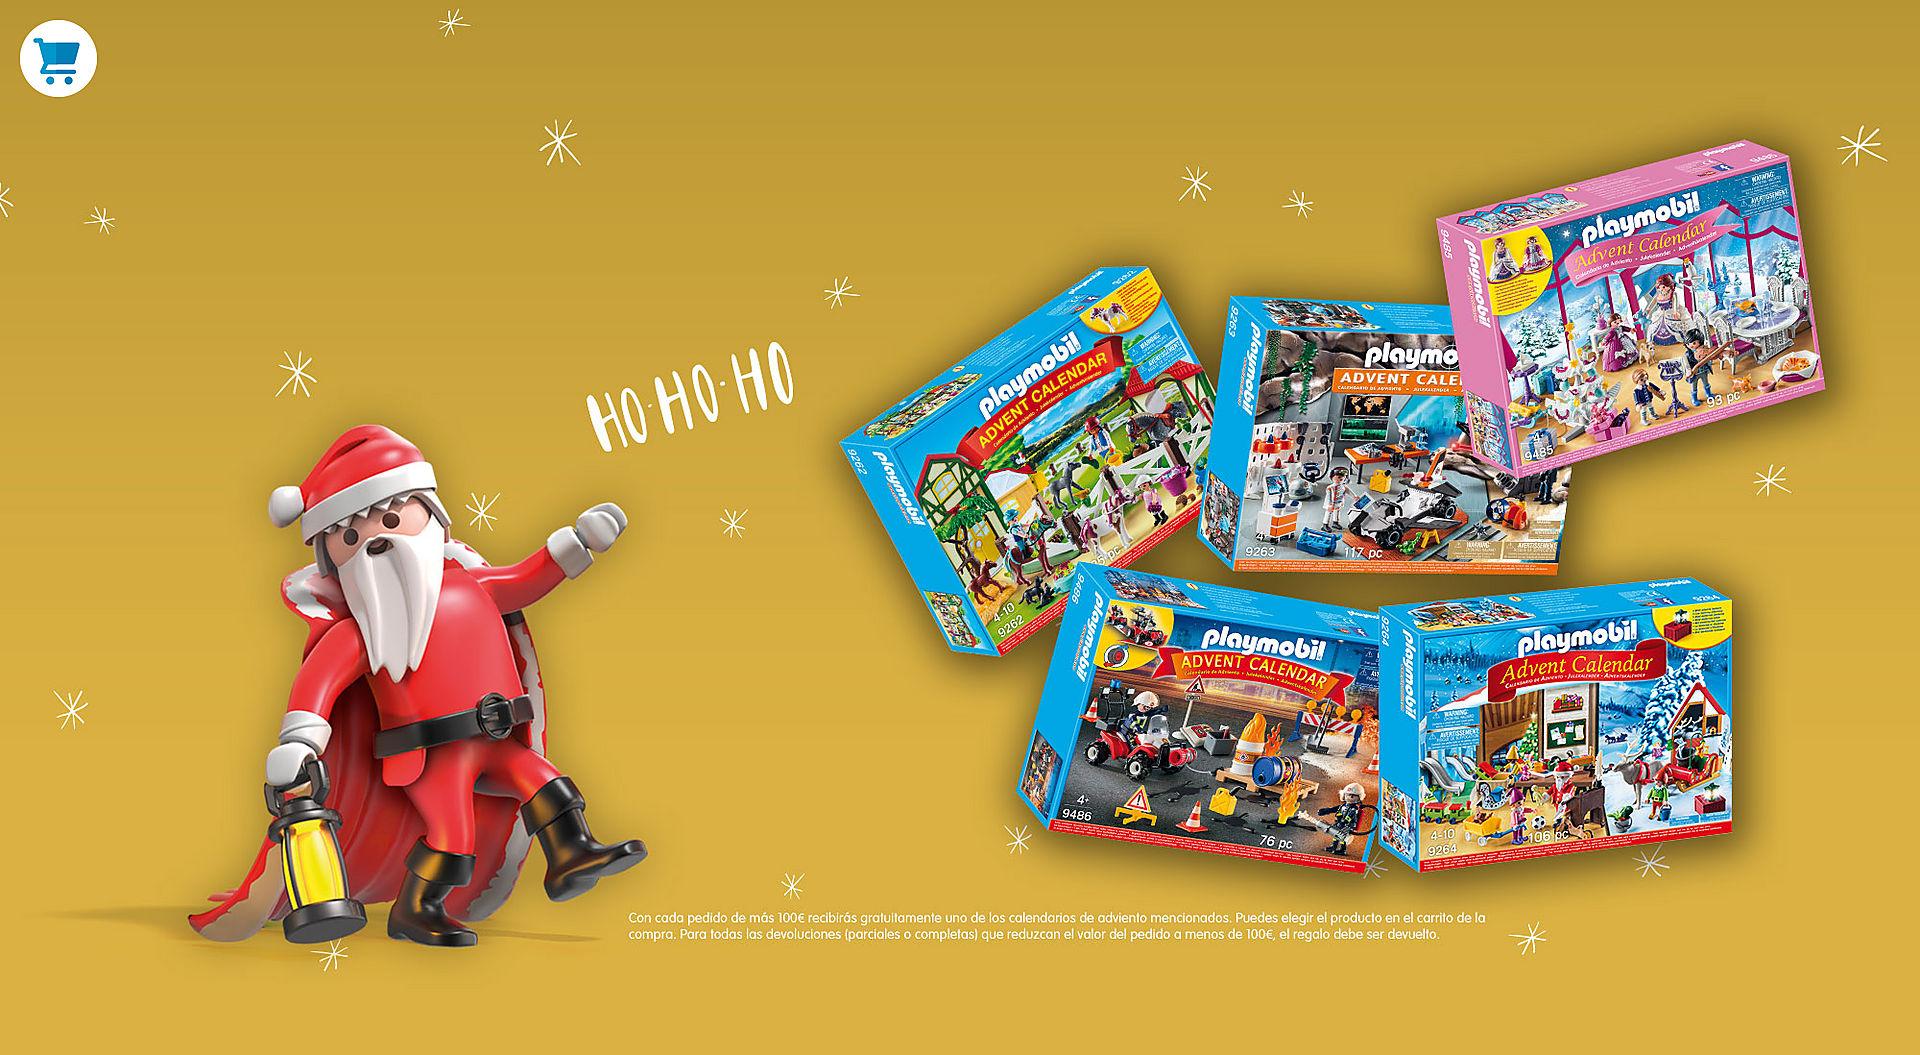 Calendario de adviento Playmobil gratis